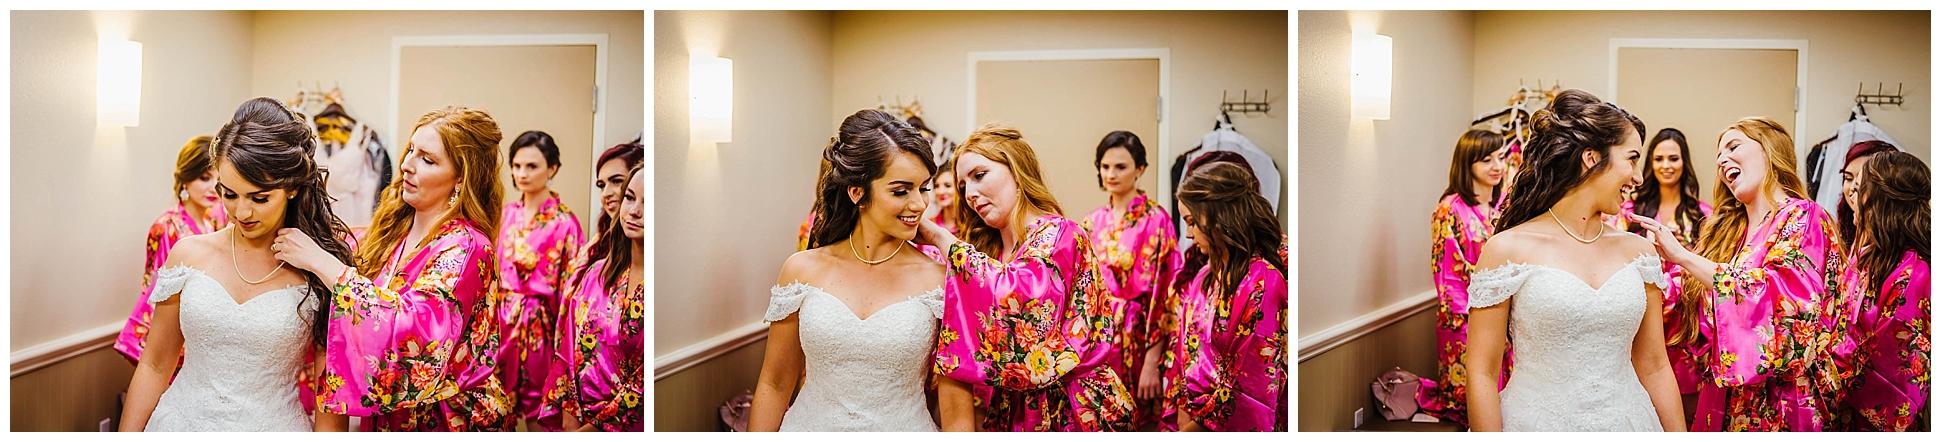 st-pete-wedding-photographer-sunken-gardens-crystal-ballroom-princess-dancer_0128.jpg